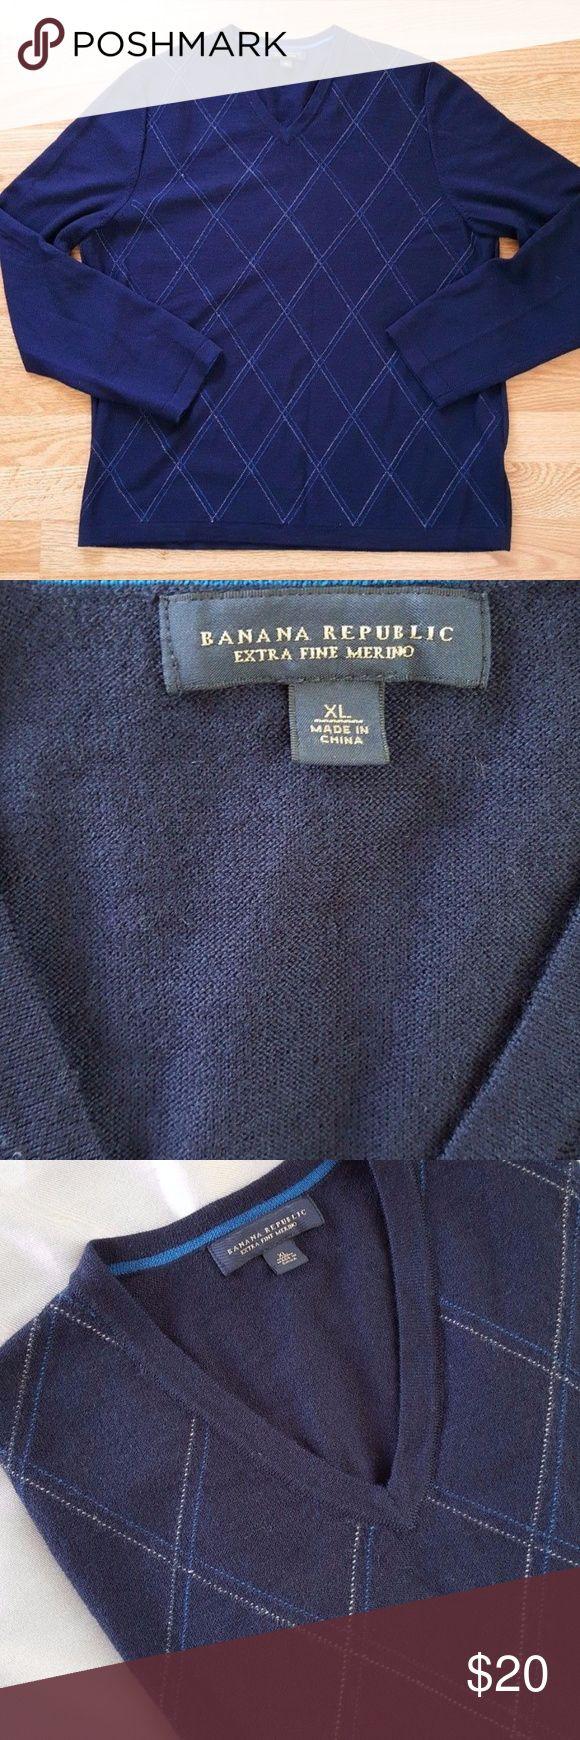 "Banana Republic Mens V-neck Sweater Merin Sz XL Banana Republic Men's Sz XL Blue Long Sleeve V Neck Sweater 100% Merino Wool  measurements :  Chest:22.5 "" Aprox Long:27 "" Aprox Sleeve :26 "" aprox shoulder: 17"" aprox  Condition: very good. Banana Republic Sweaters V-Neck"